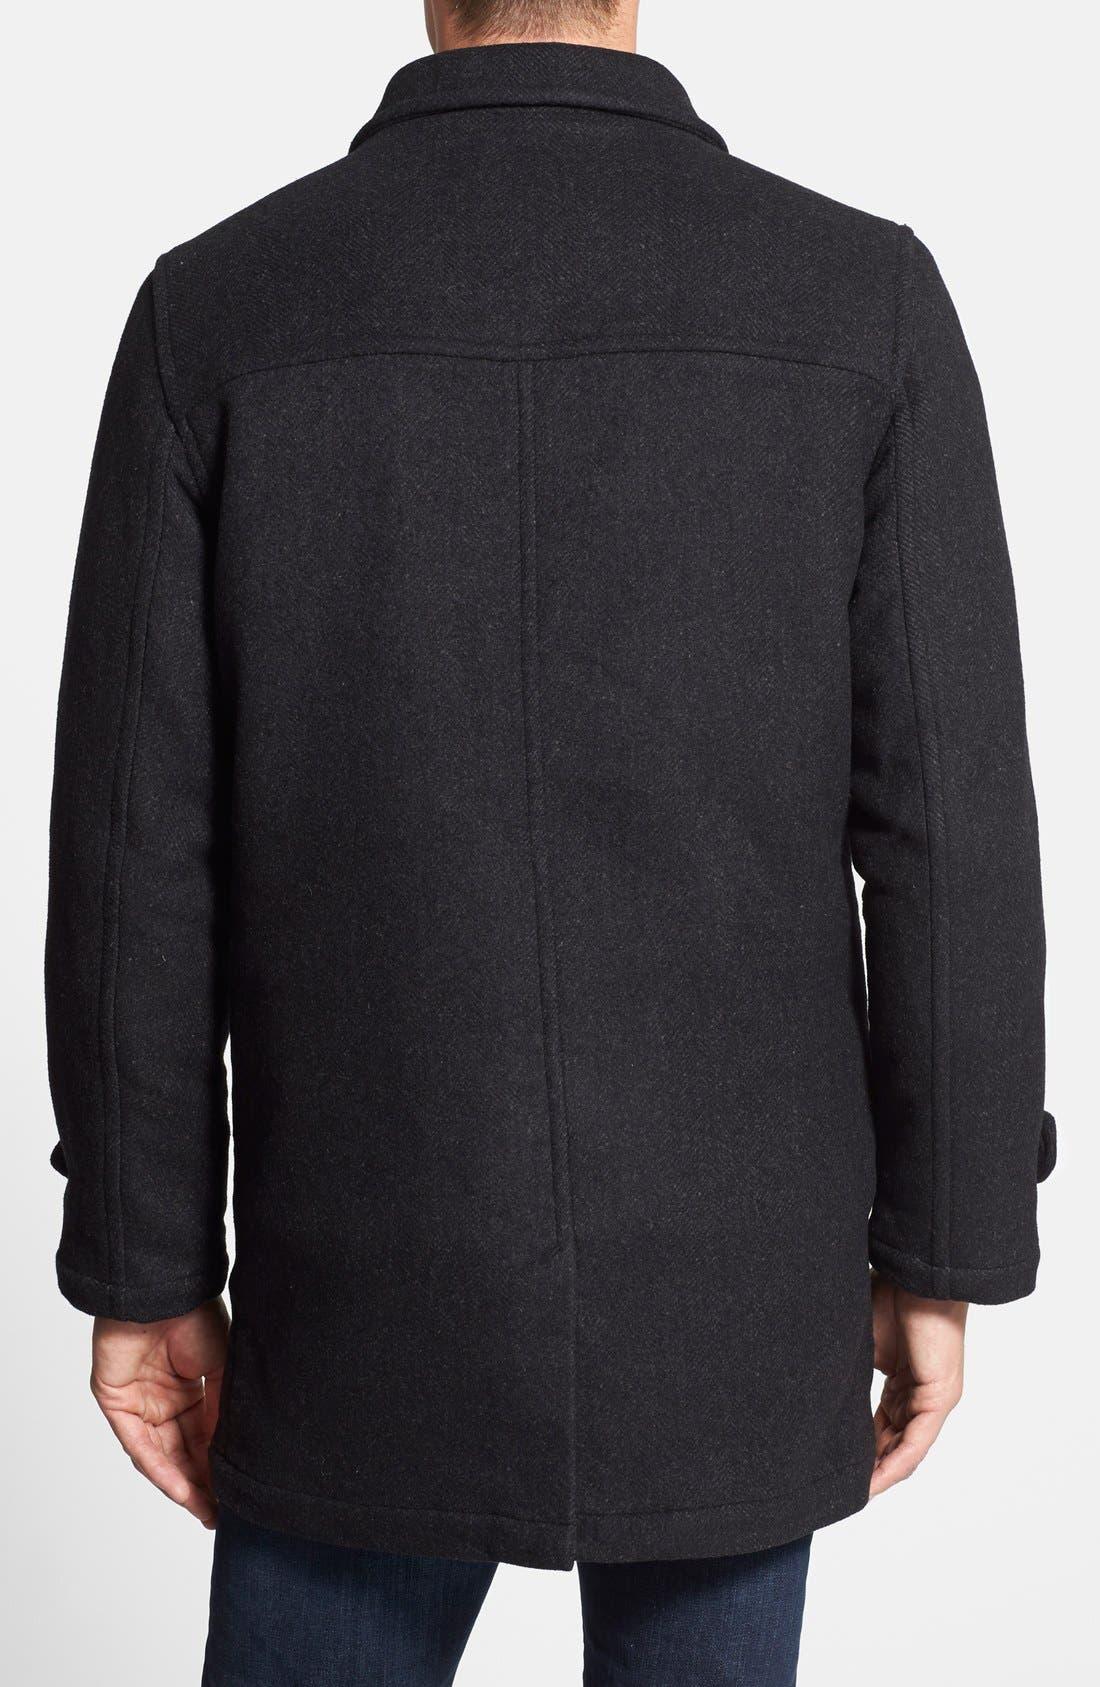 Alternate Image 2  - Rodd & Gunn 'Westown' 3-in-1 Wool Blend Coat